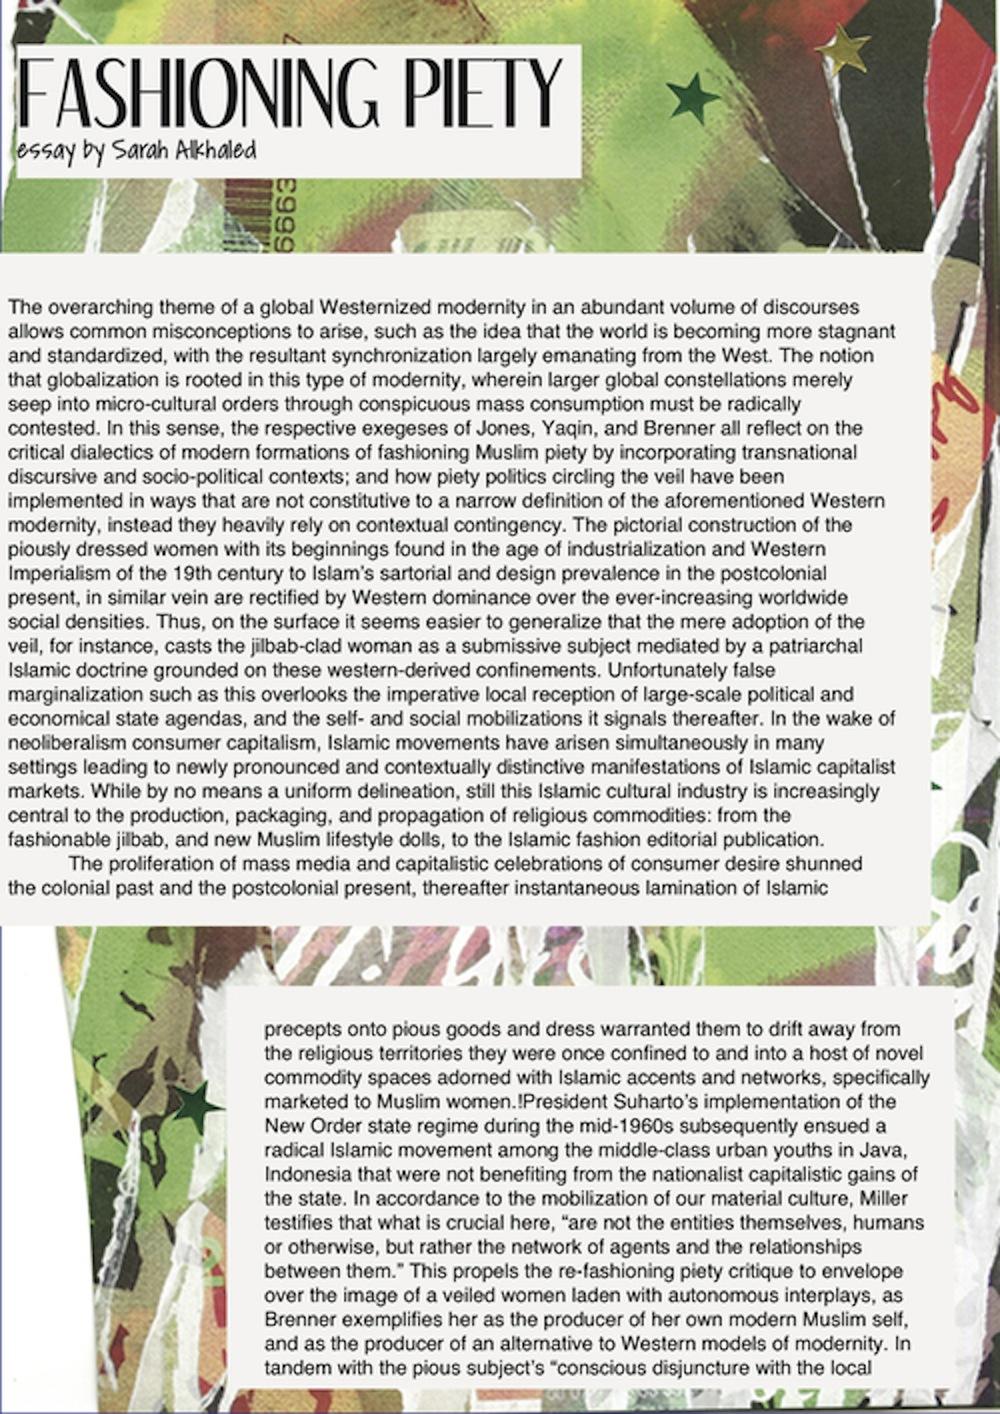 academic_fashioning-piety_1.jpg